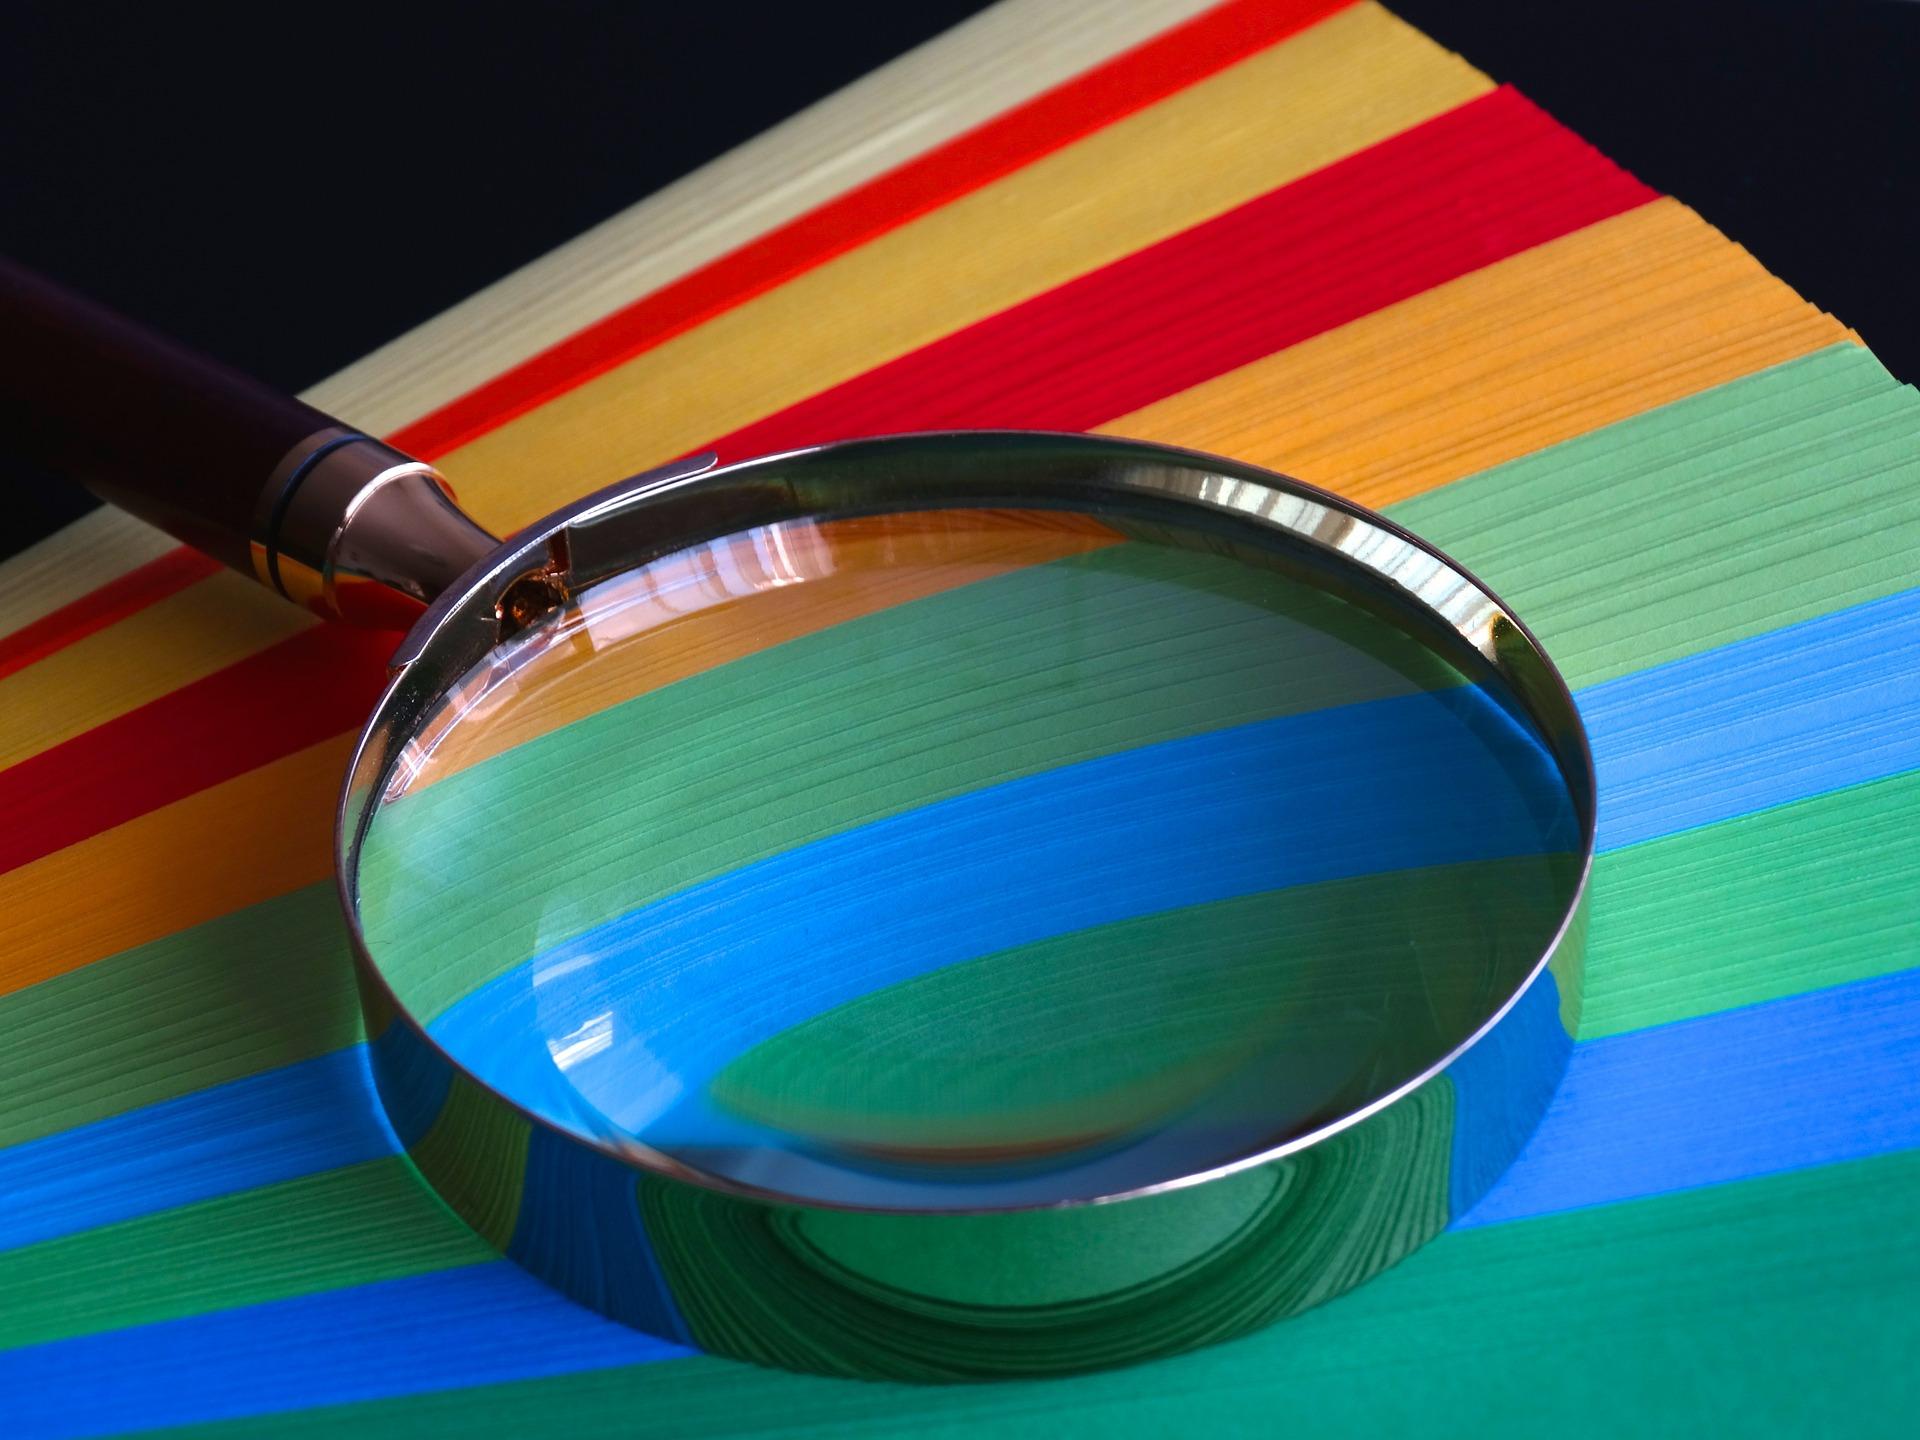 magnifying-glass-633057_1920.jpg